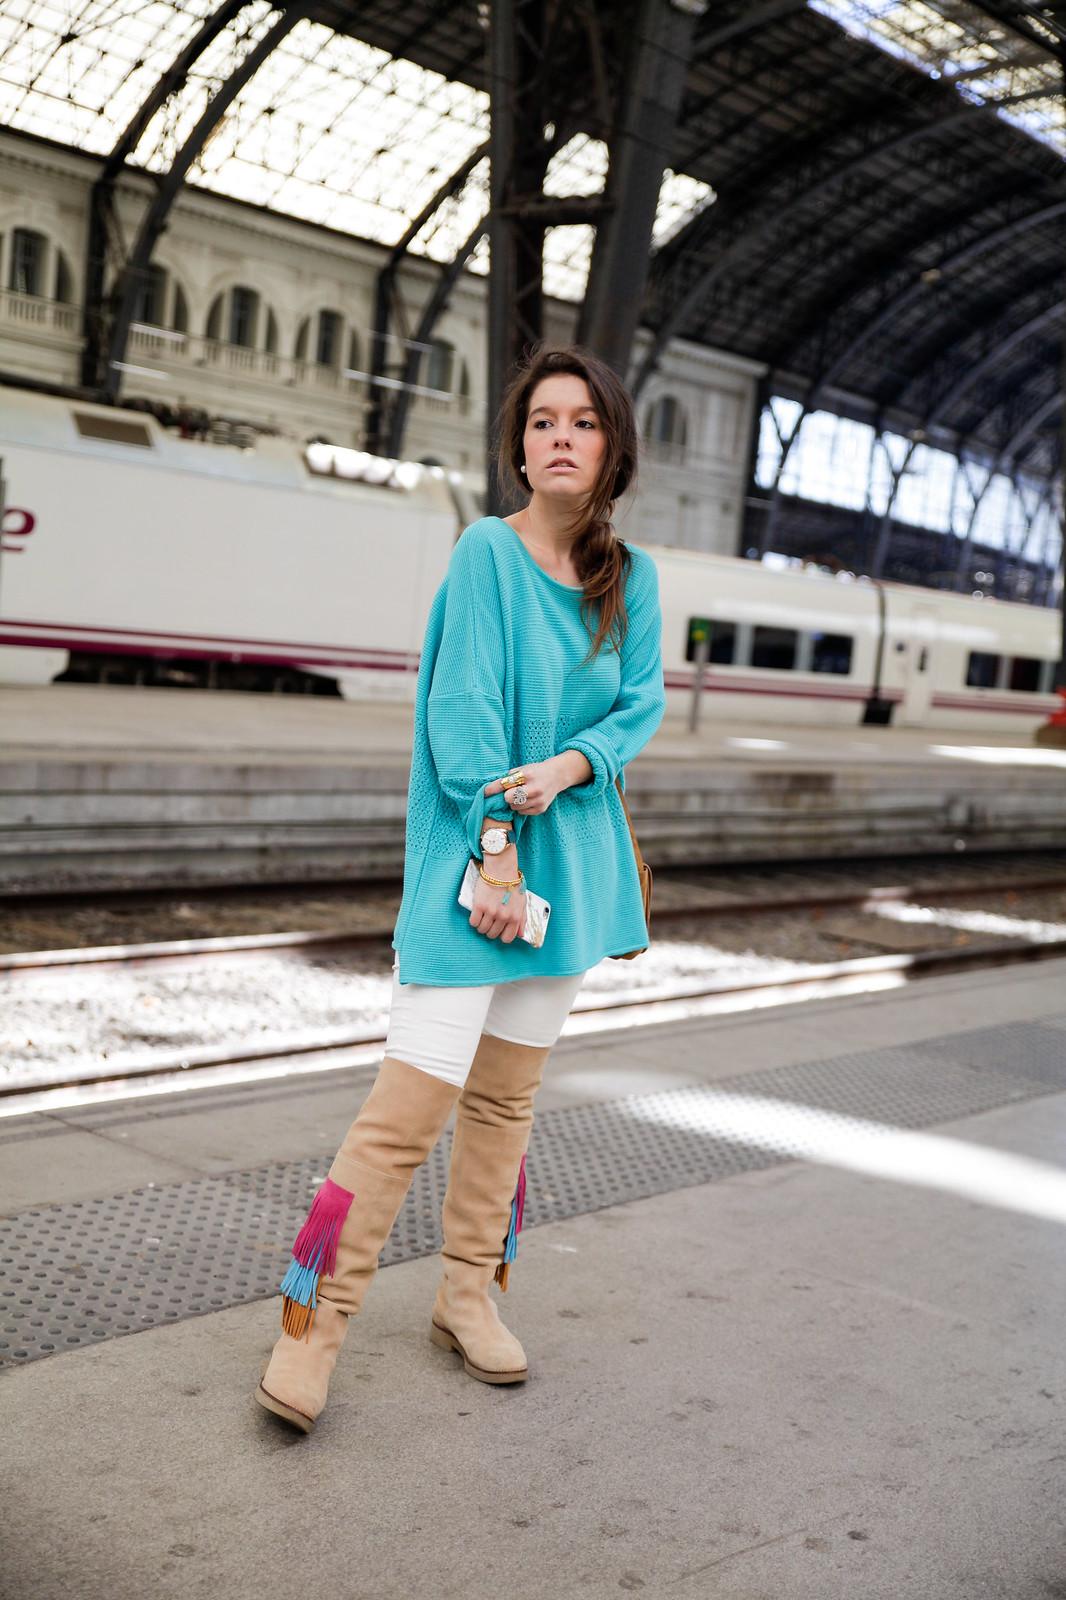 09_como_combinar_la_ropa_verde_turquesa_ideas_look_street_style_theguestgirl_ruga_boots_fringes_barcelona_influencer_top_blogger